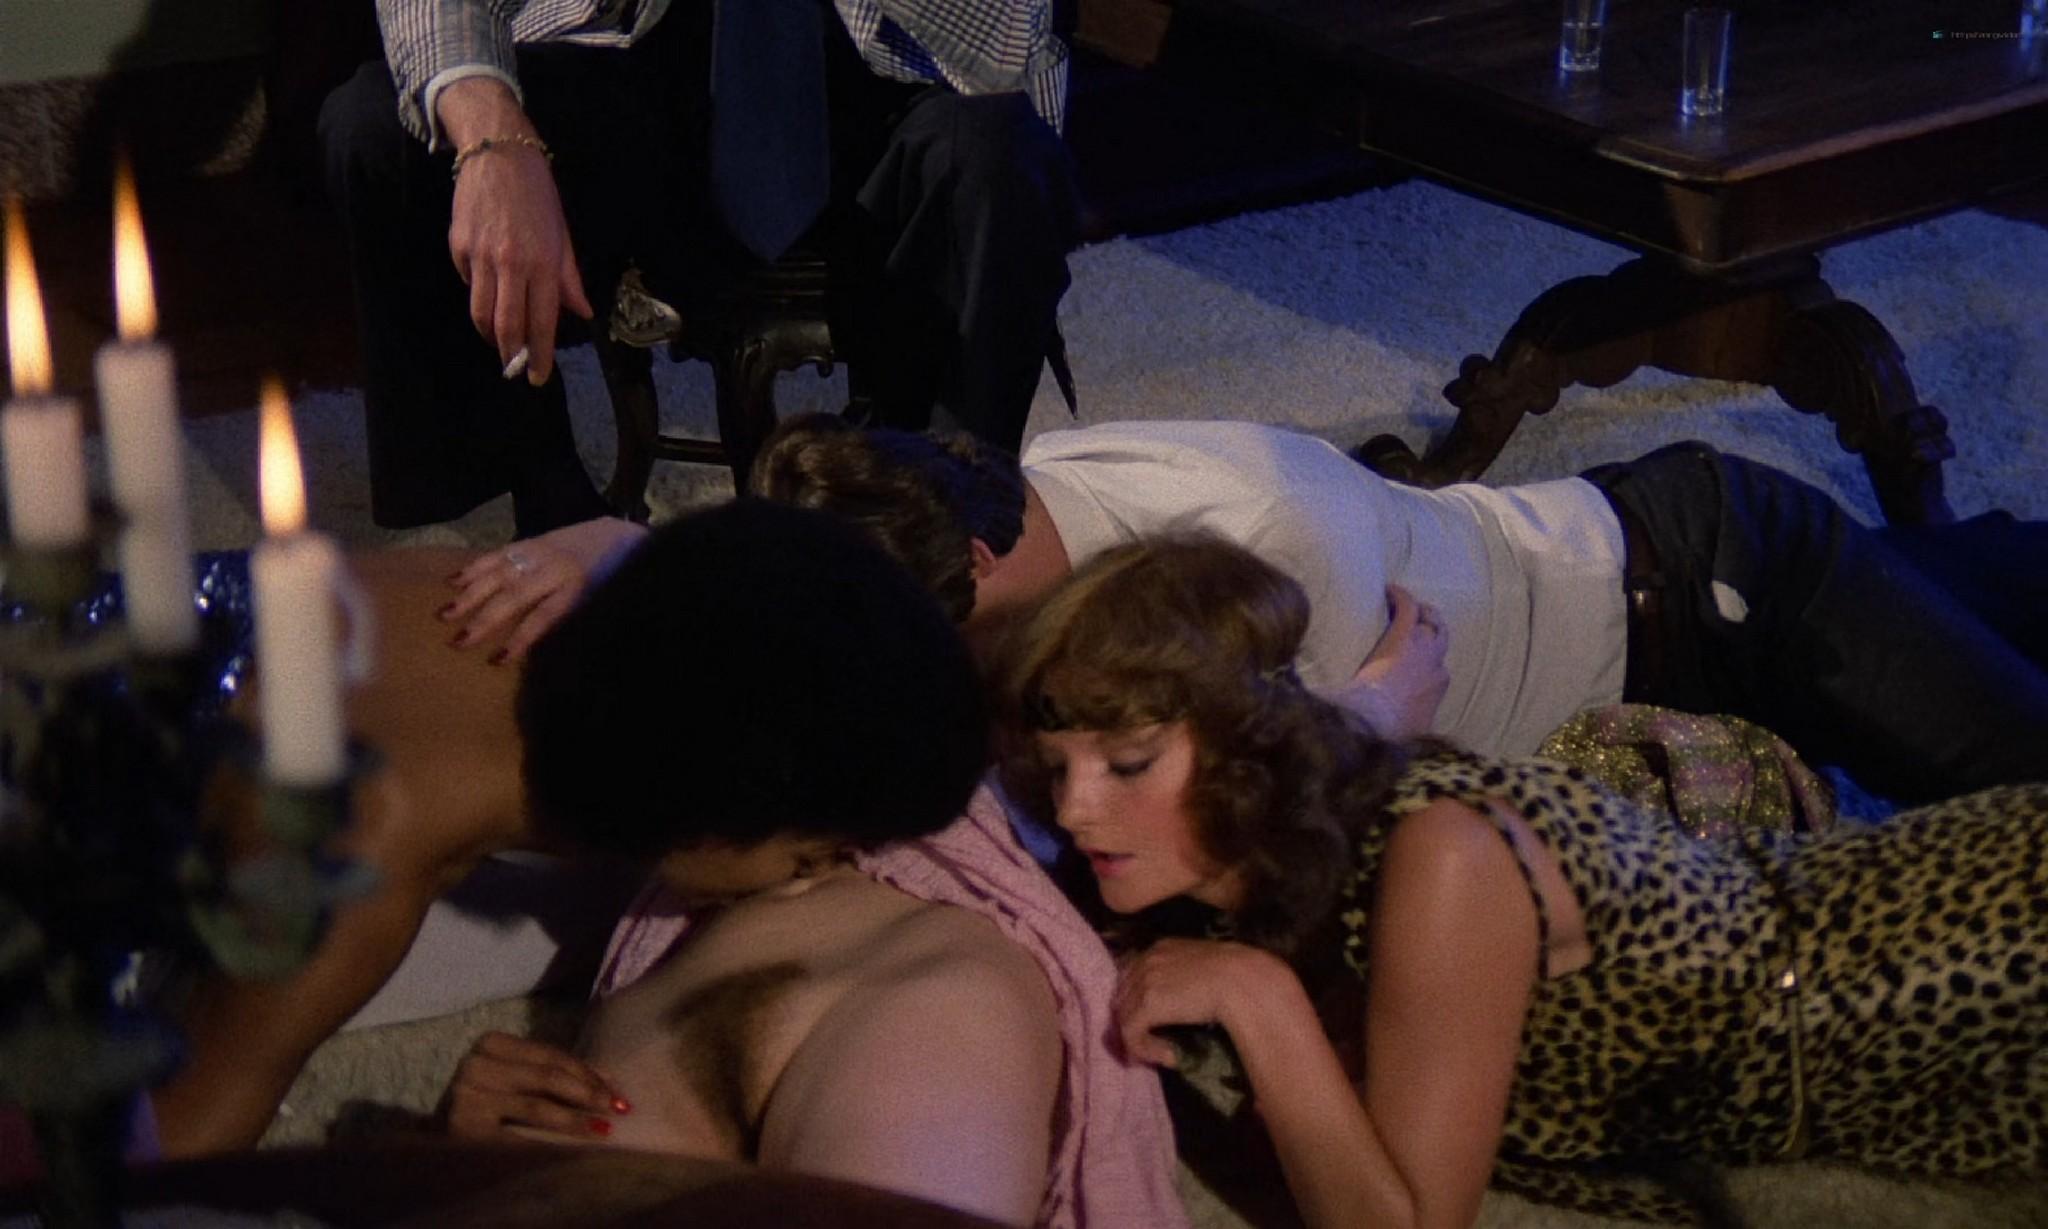 Muriel Montosse nude full frontal Ana Paula Lina Romay nude too Cecilia 1983 HD 1080p BluRay REMUX 011